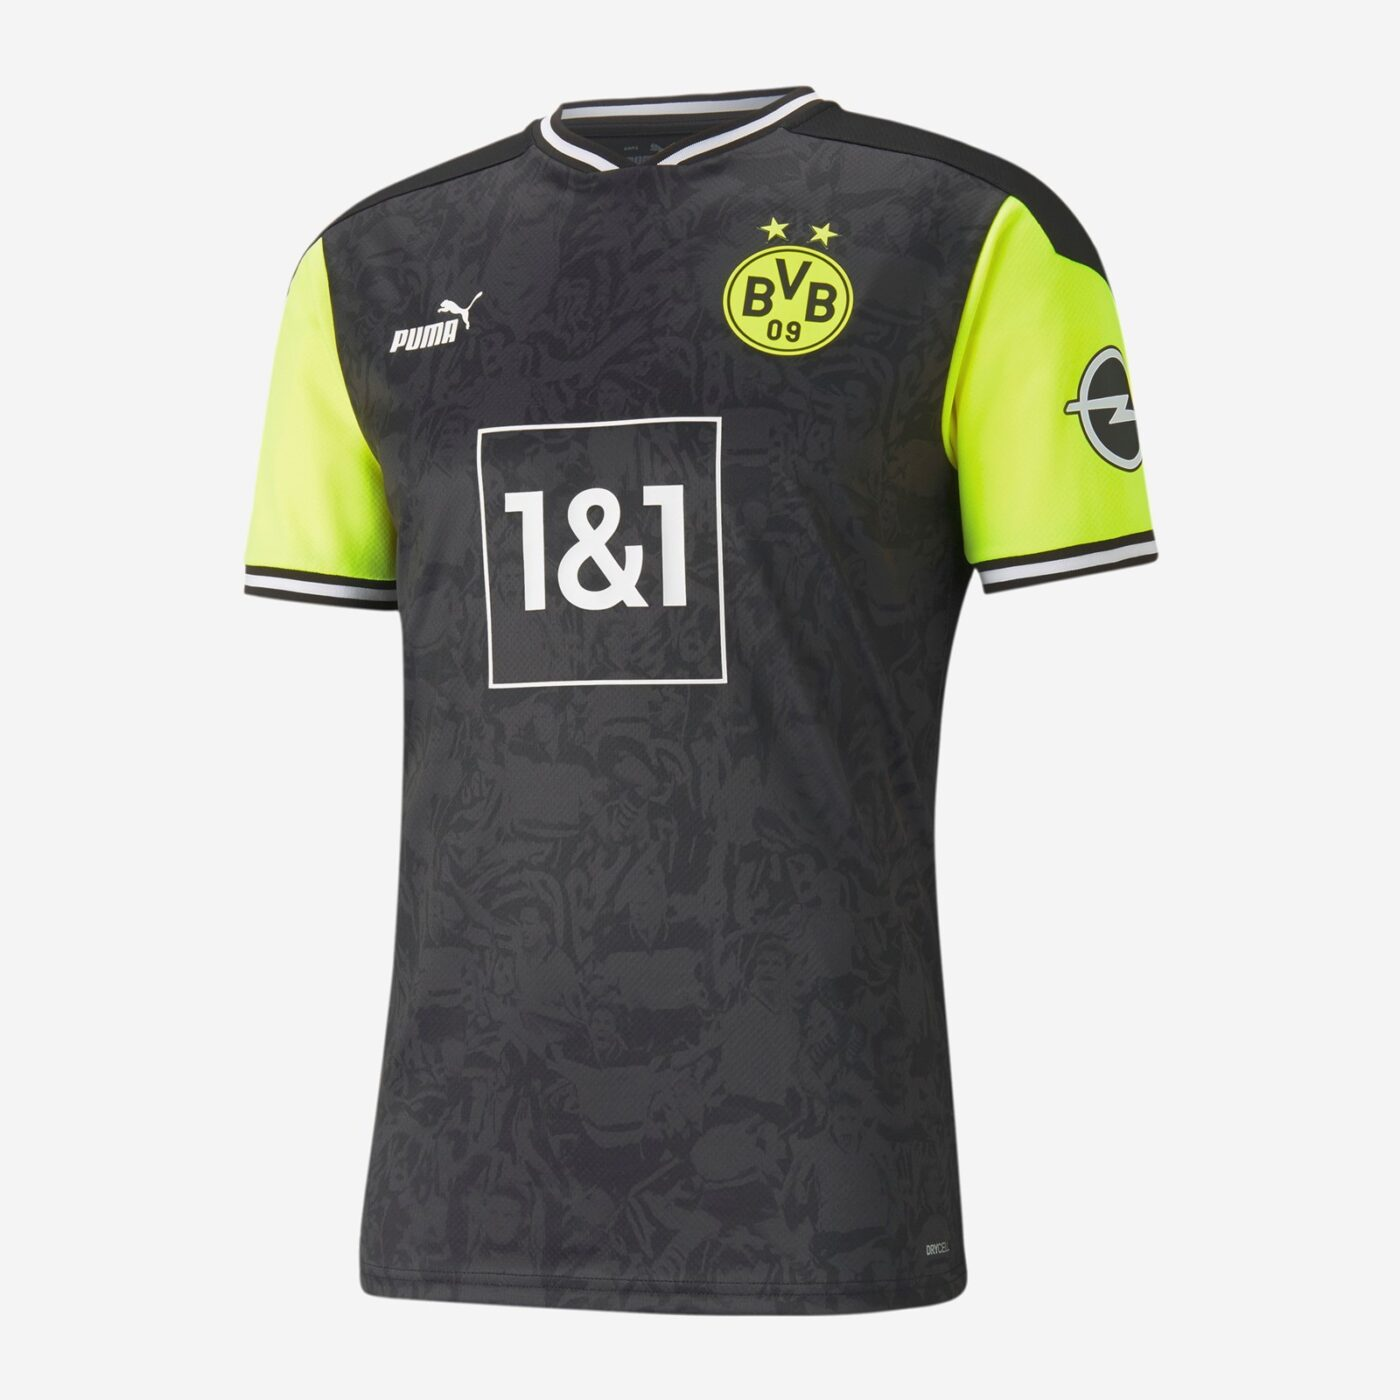 Maillot rétro Borussia Dortmund PUMA années 90